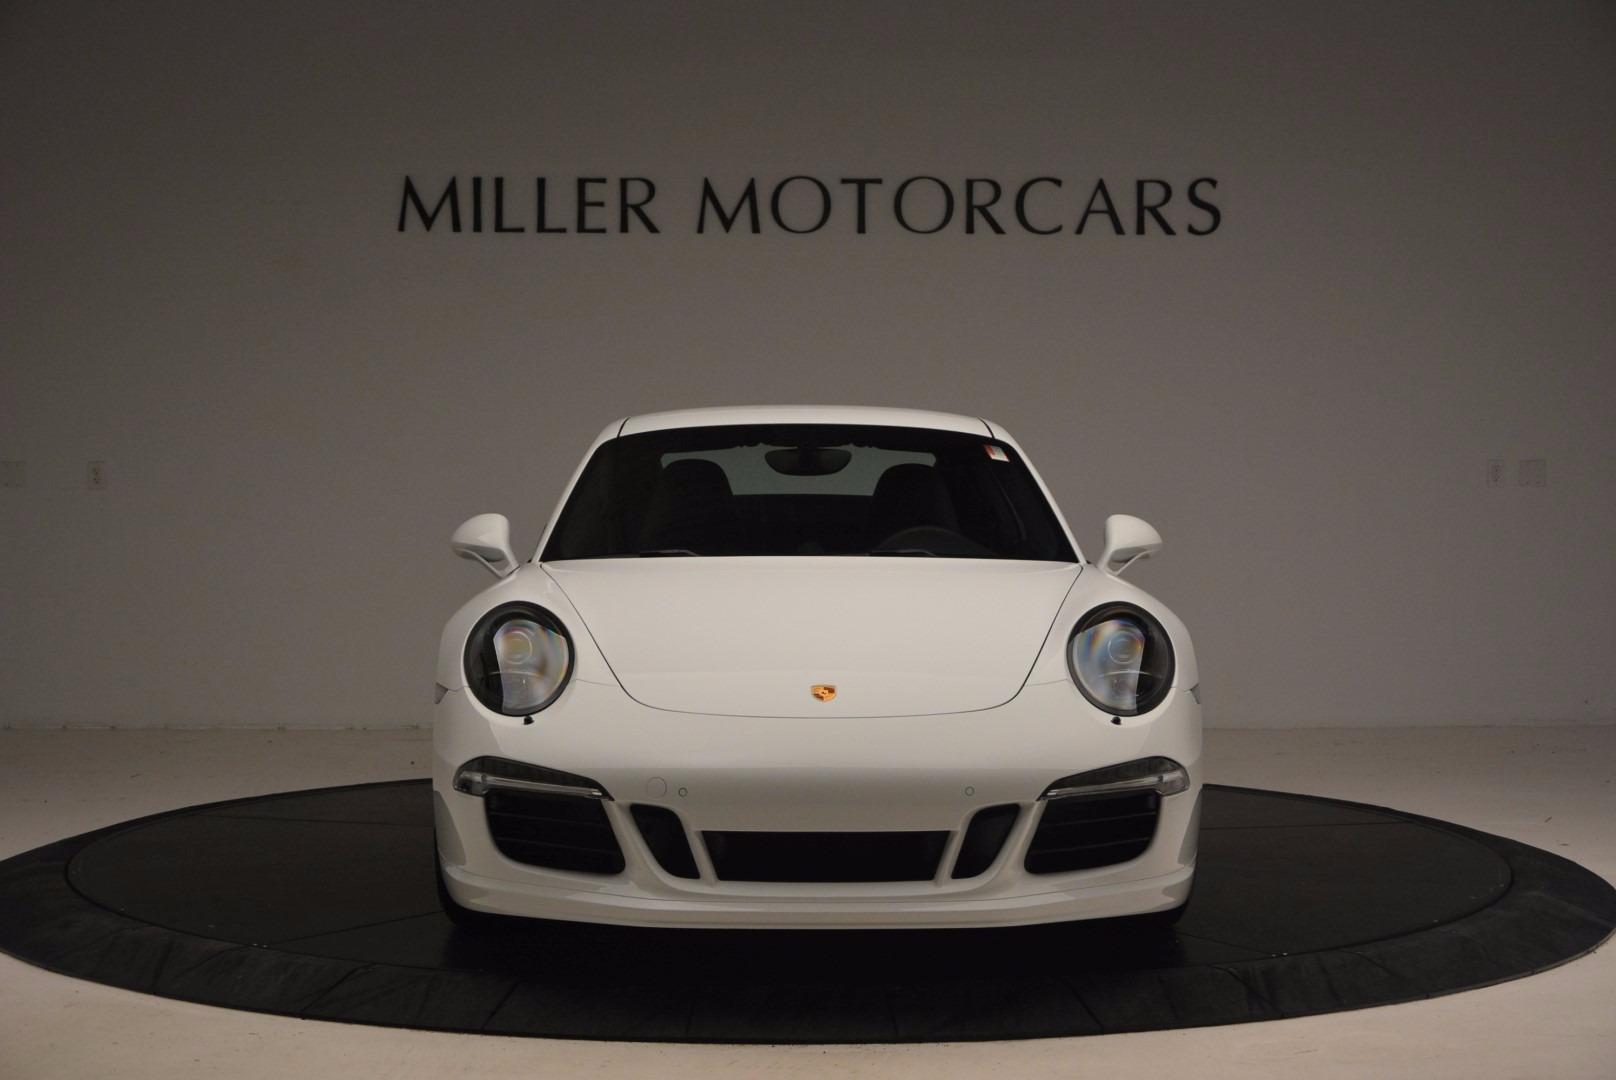 Used 2015 Porsche 911 Carrera GTS For Sale In Greenwich, CT 1444_p13